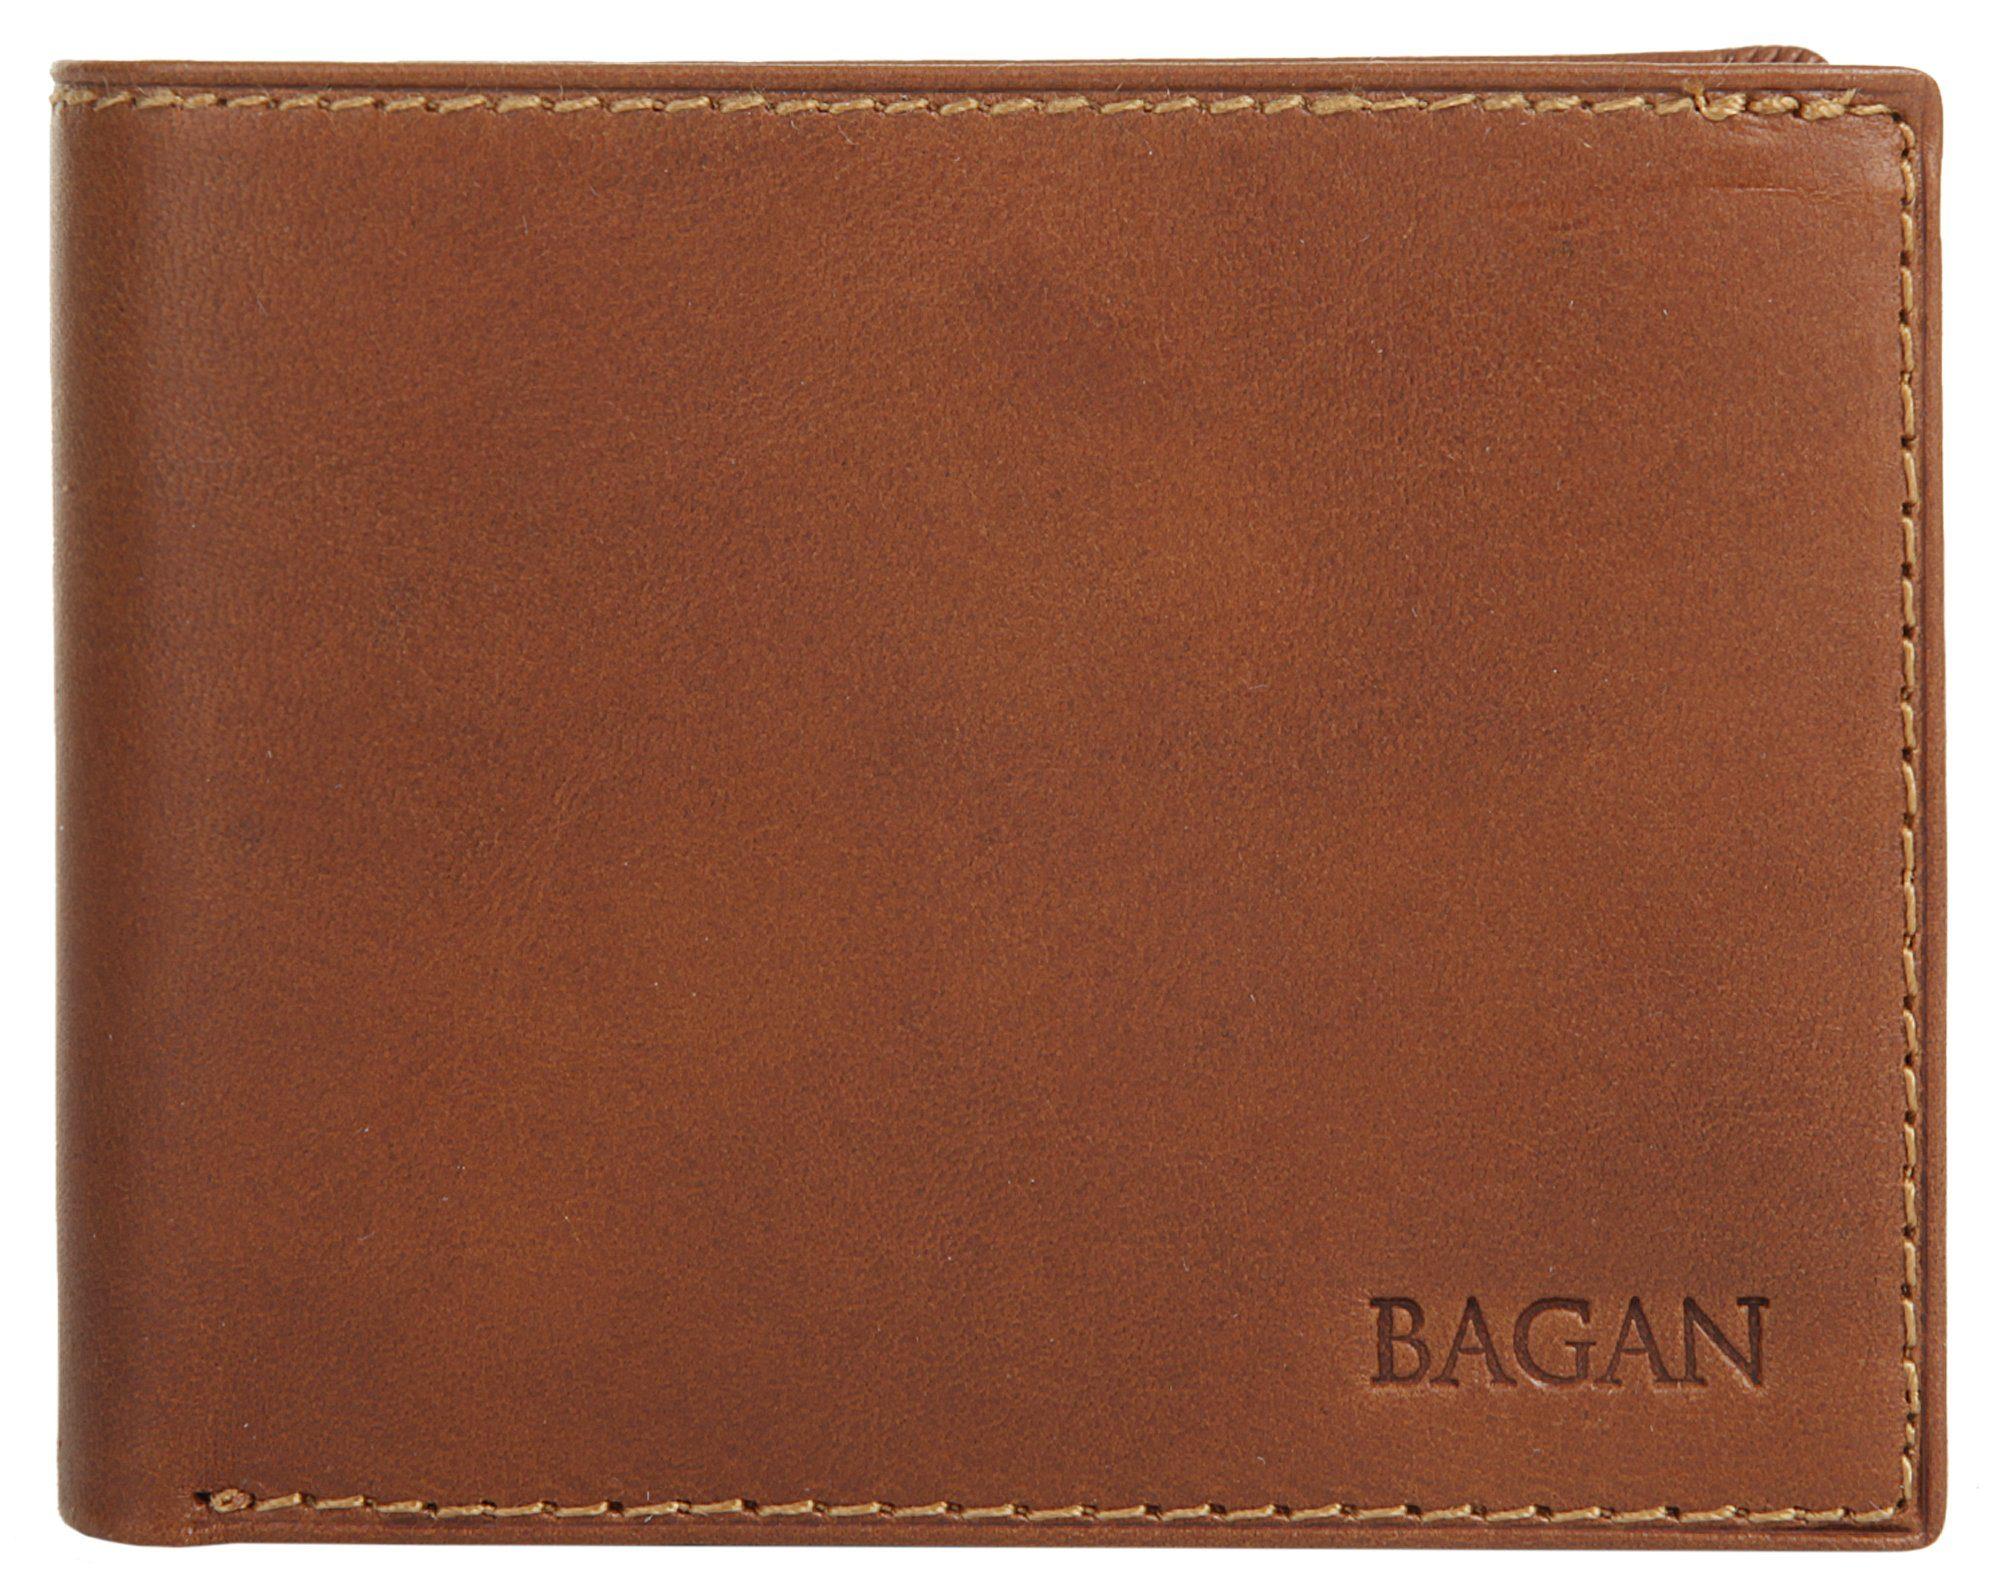 Bagan Geldbörse »BICOLORE MOGANO«, Kreditkartenfächer